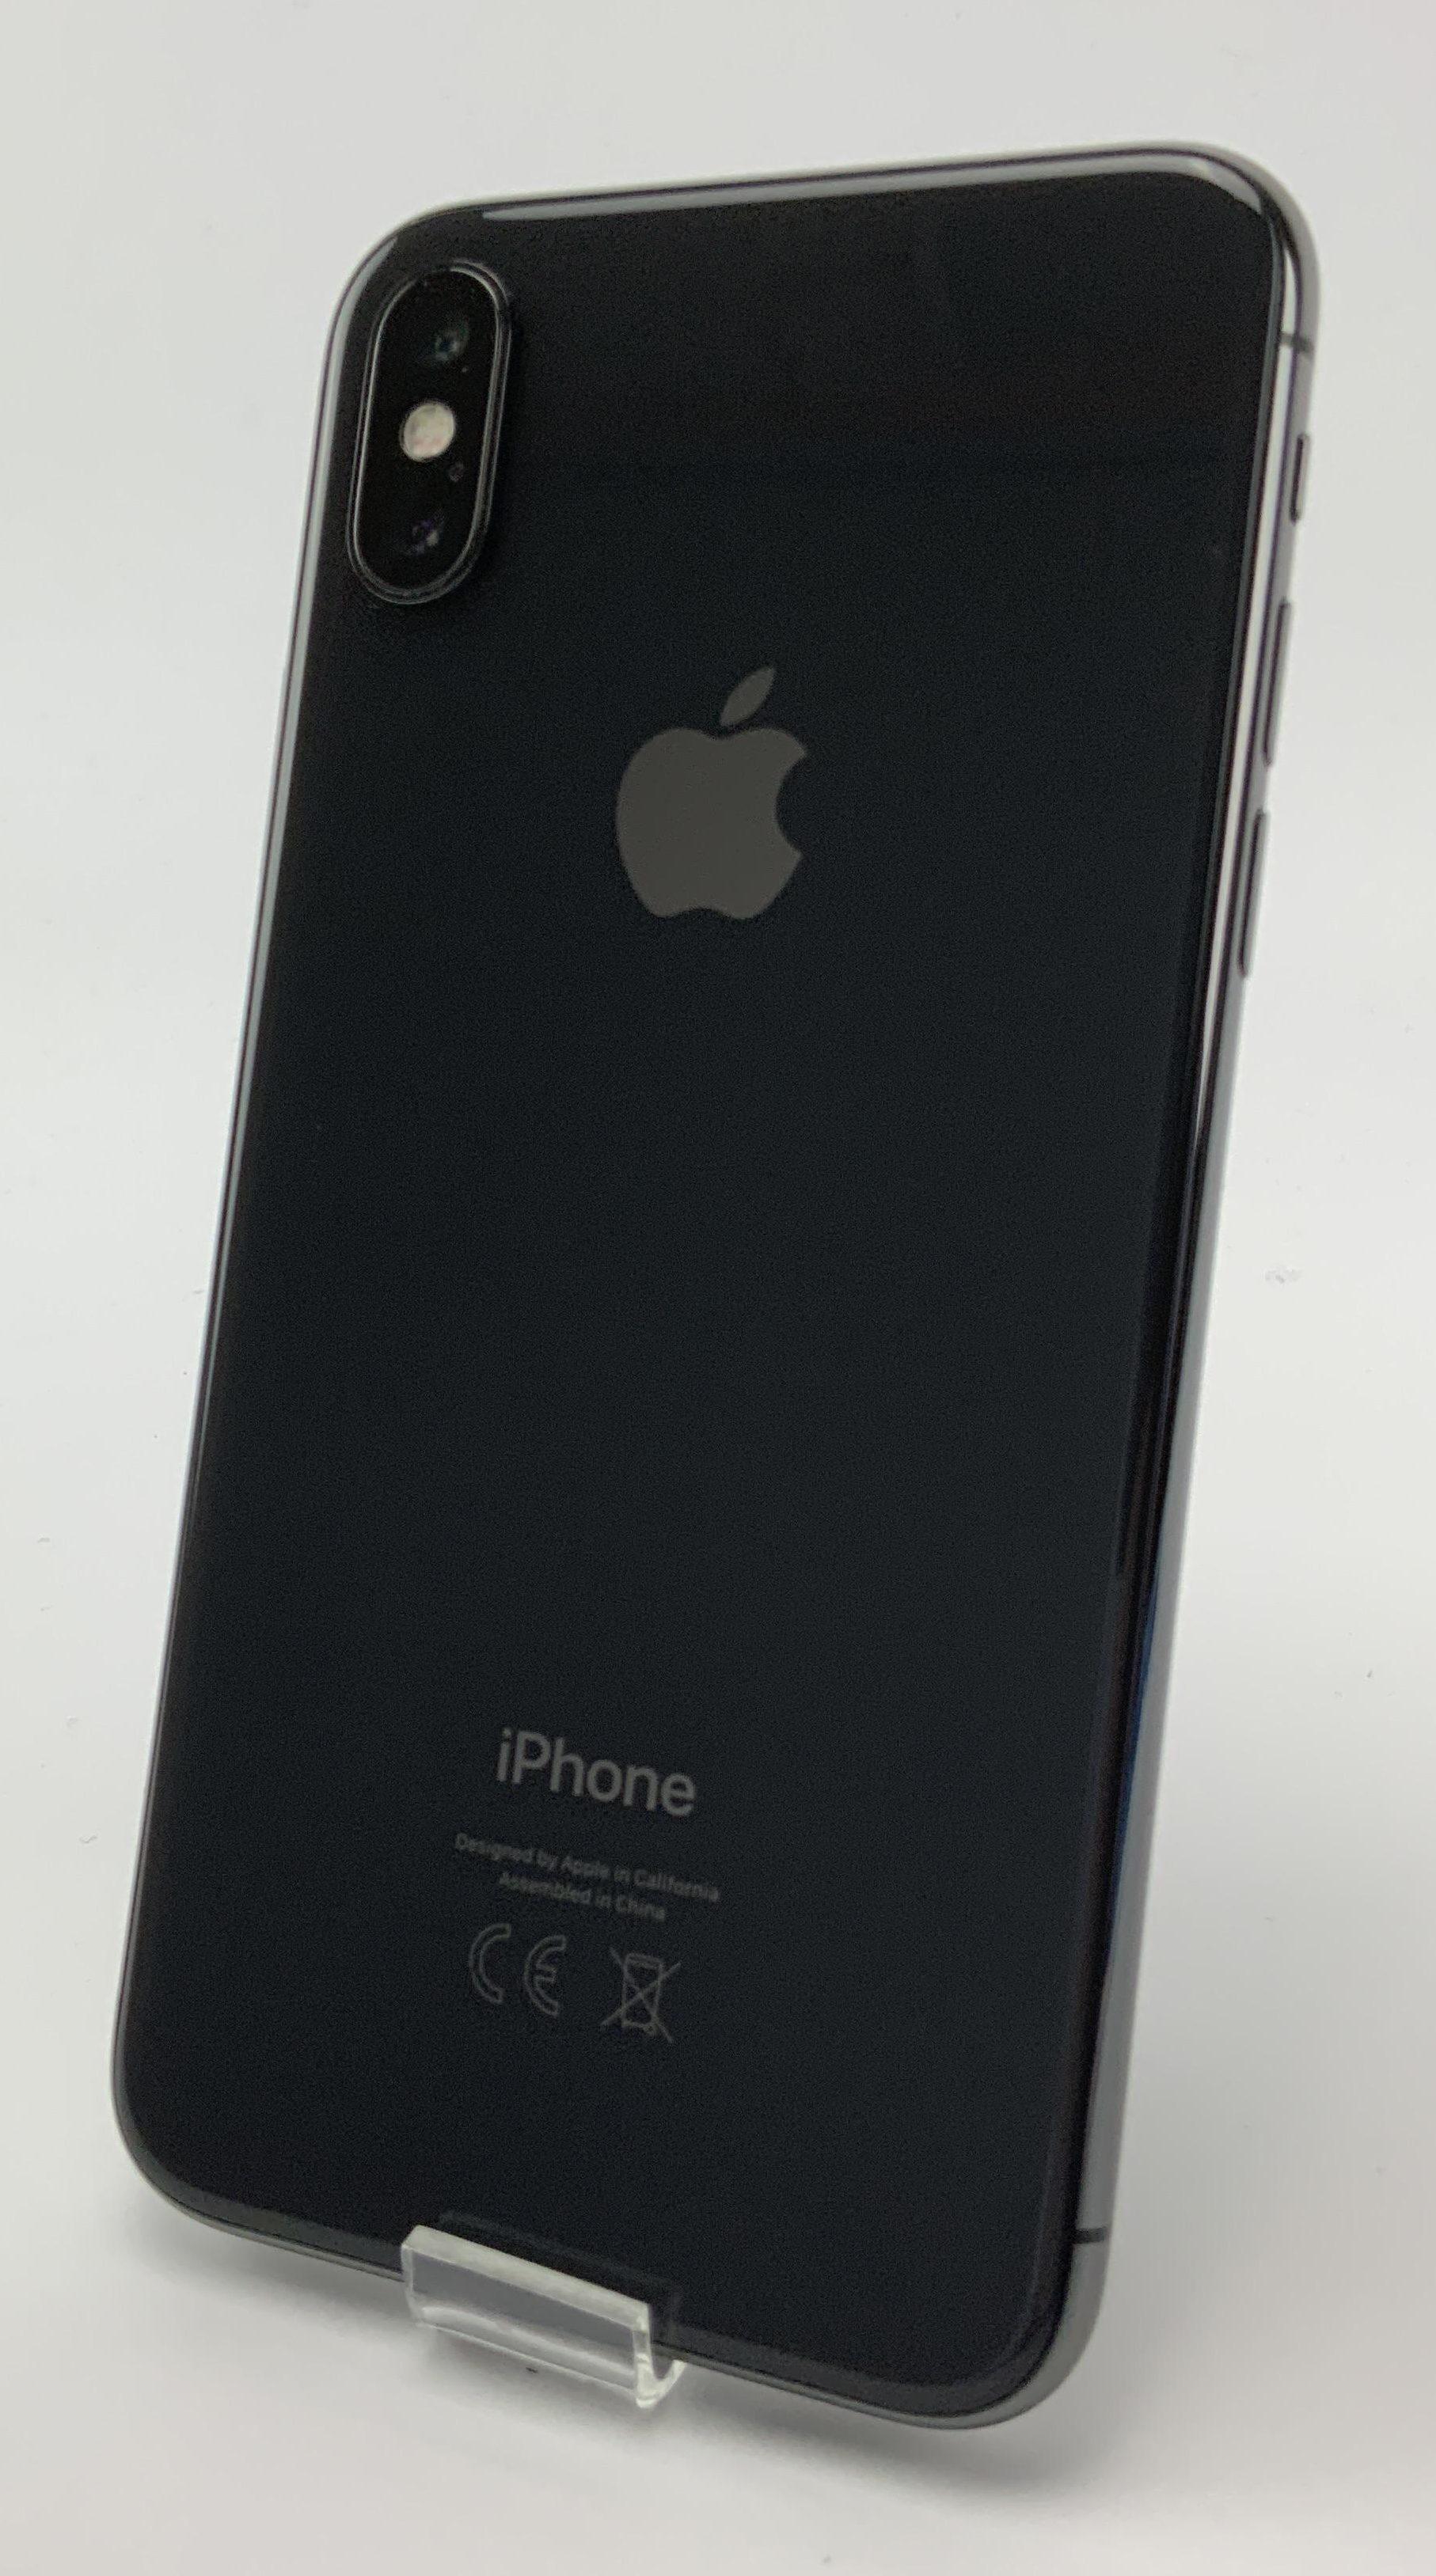 iPhone X 64GB, 64GB, Space Gray, obraz 2